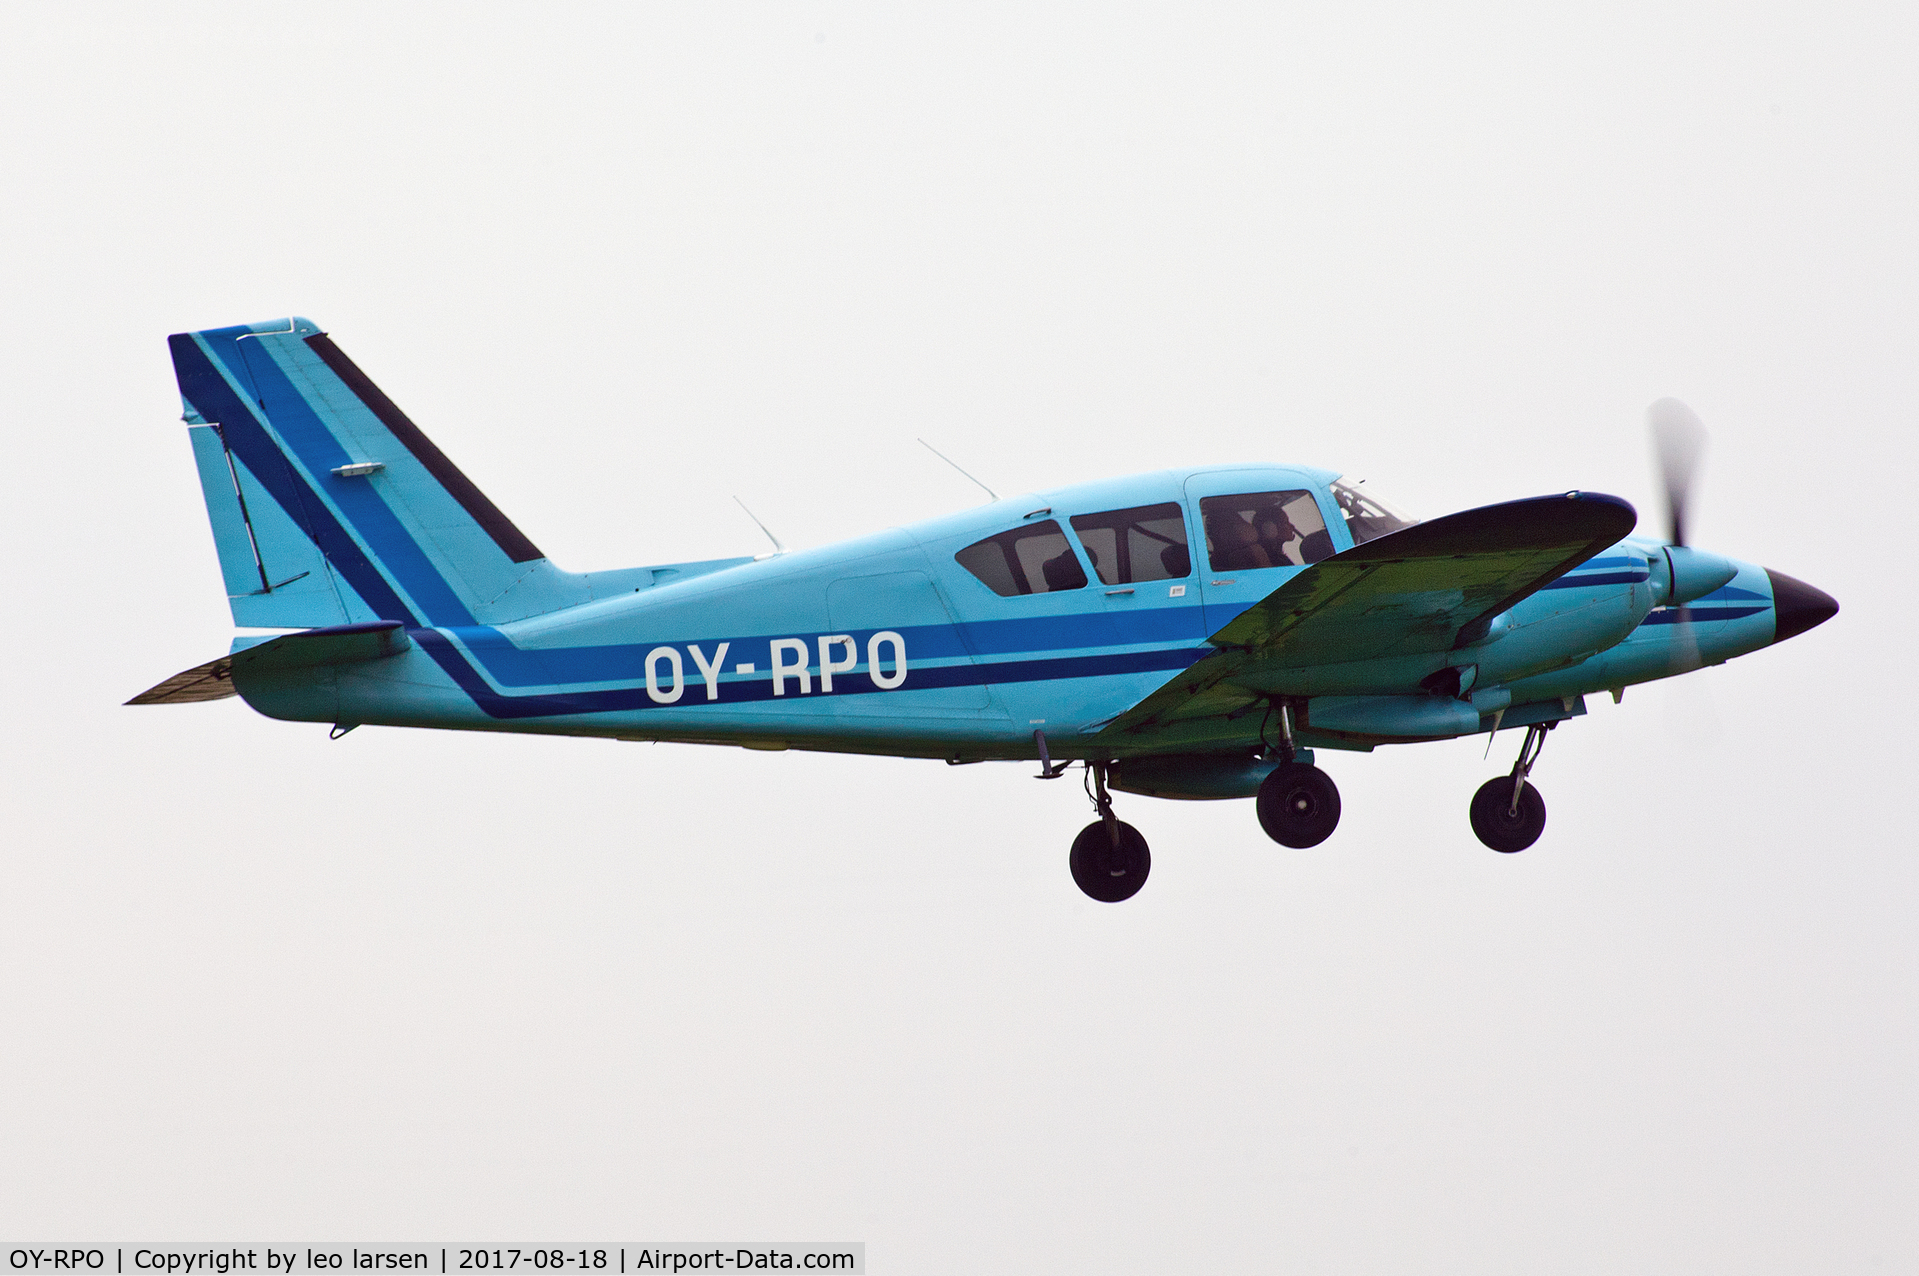 OY-RPO, 1975 Piper PA-23-250 Aztec C/N 27-7554144, Copenhagen kløvermarken 18.8.2017